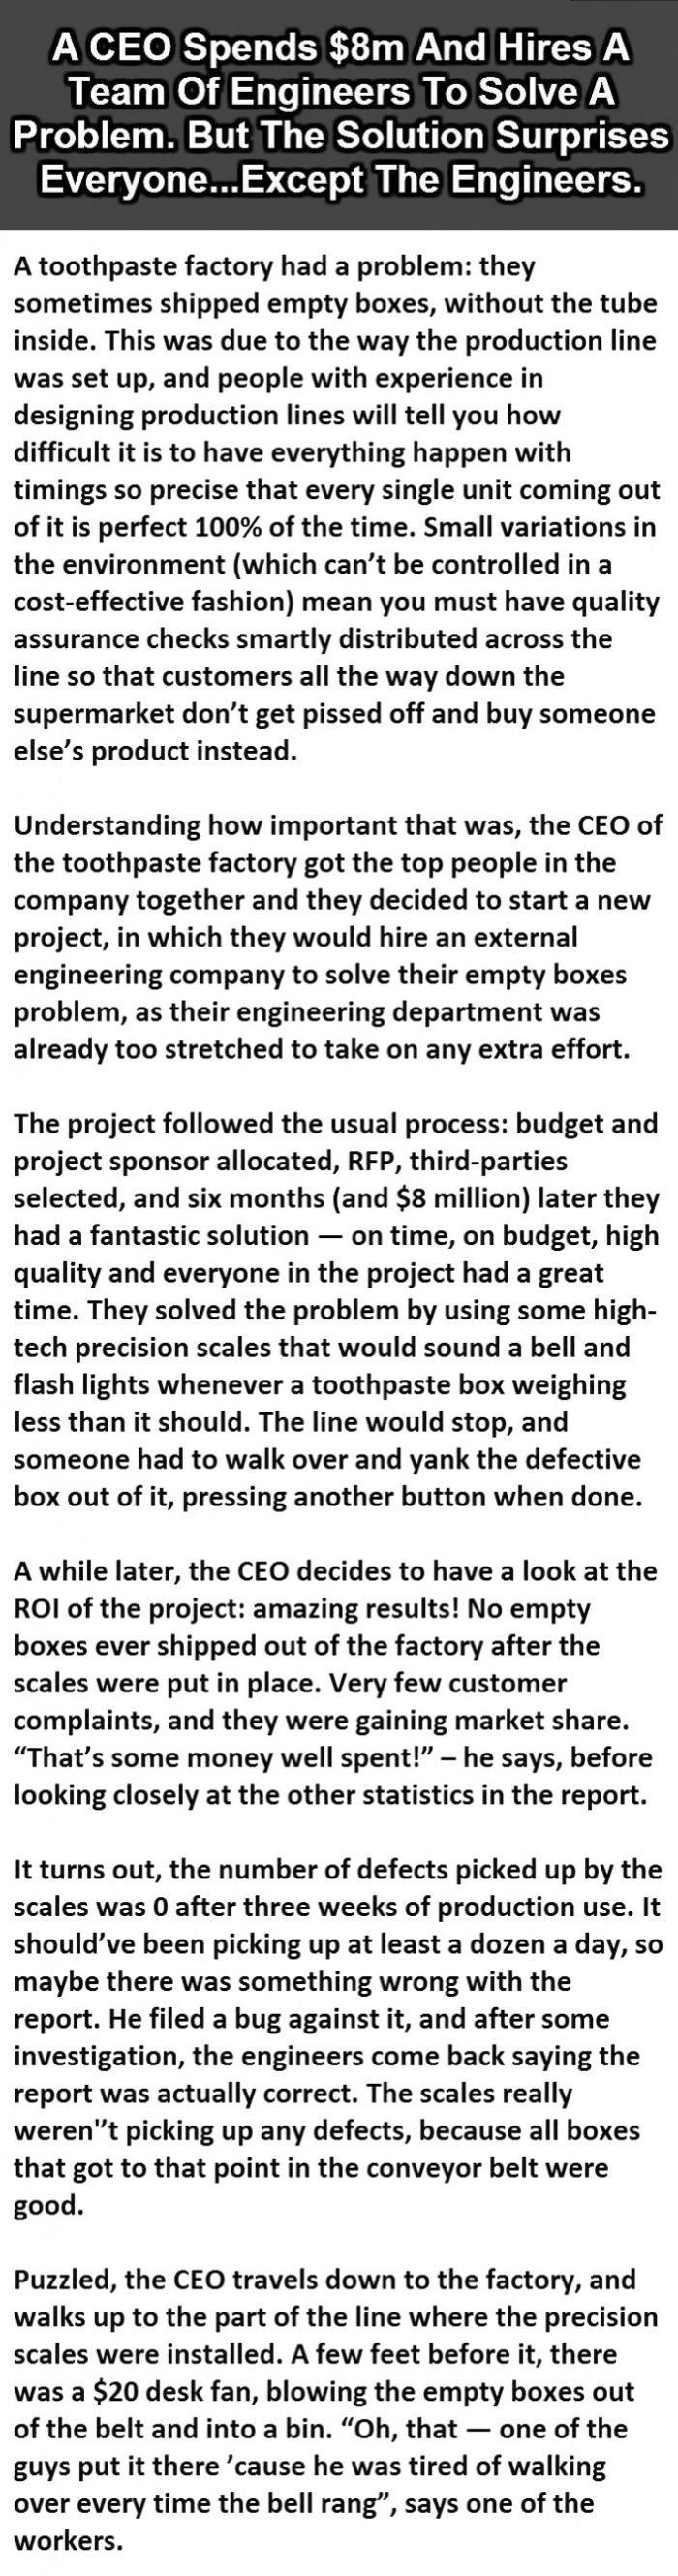 Engineers will understand